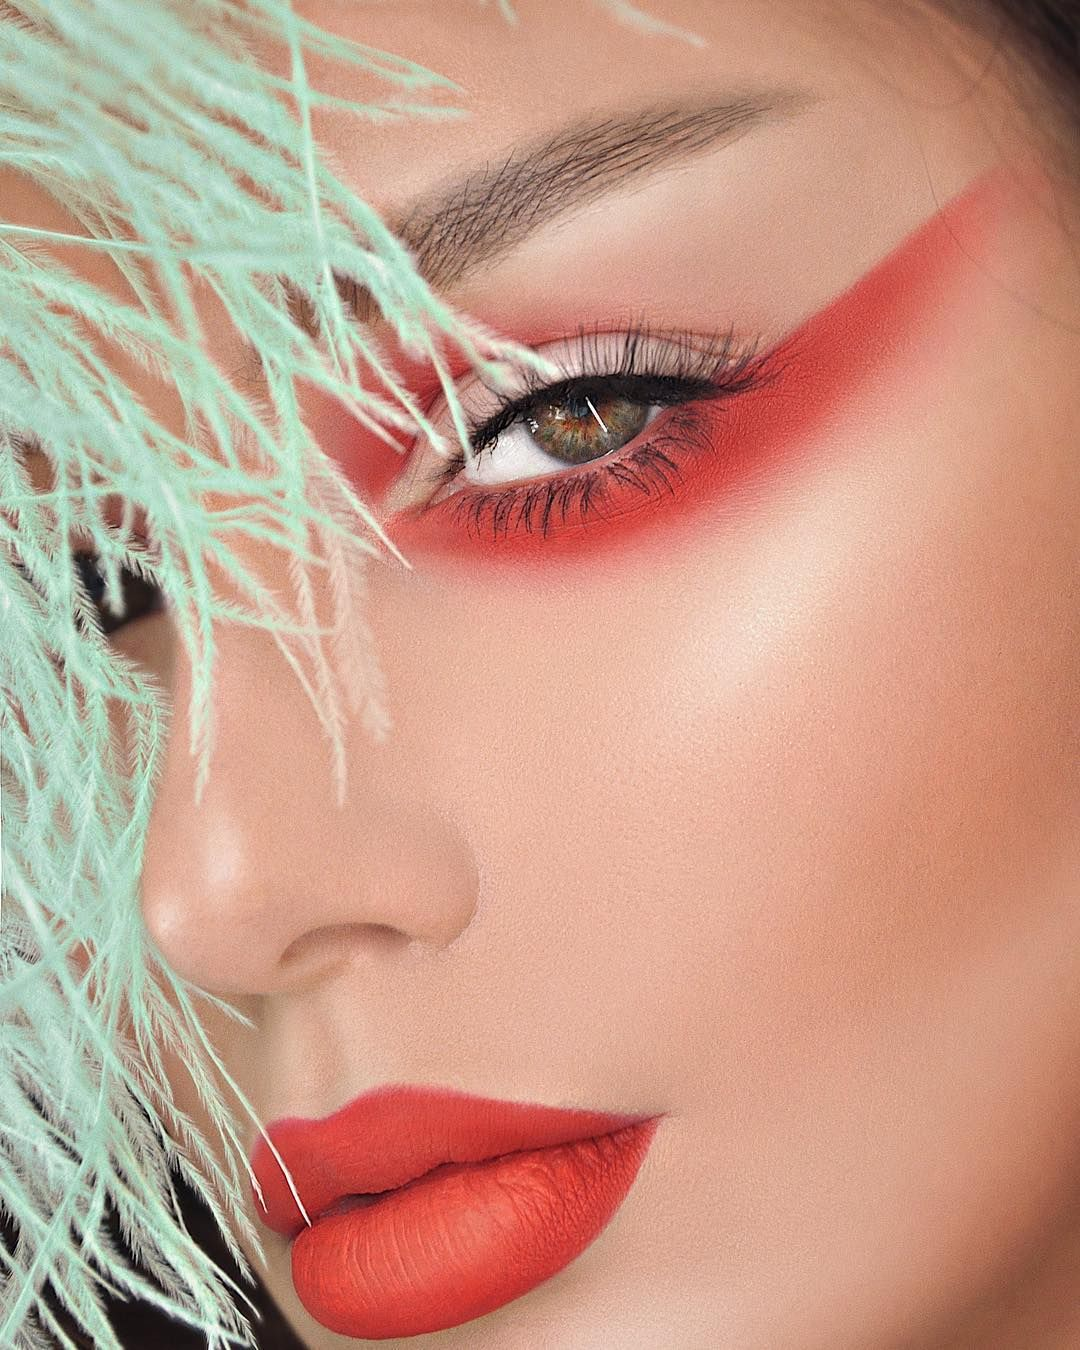 Artist couture diamond glow powder swatches by Mac daddy